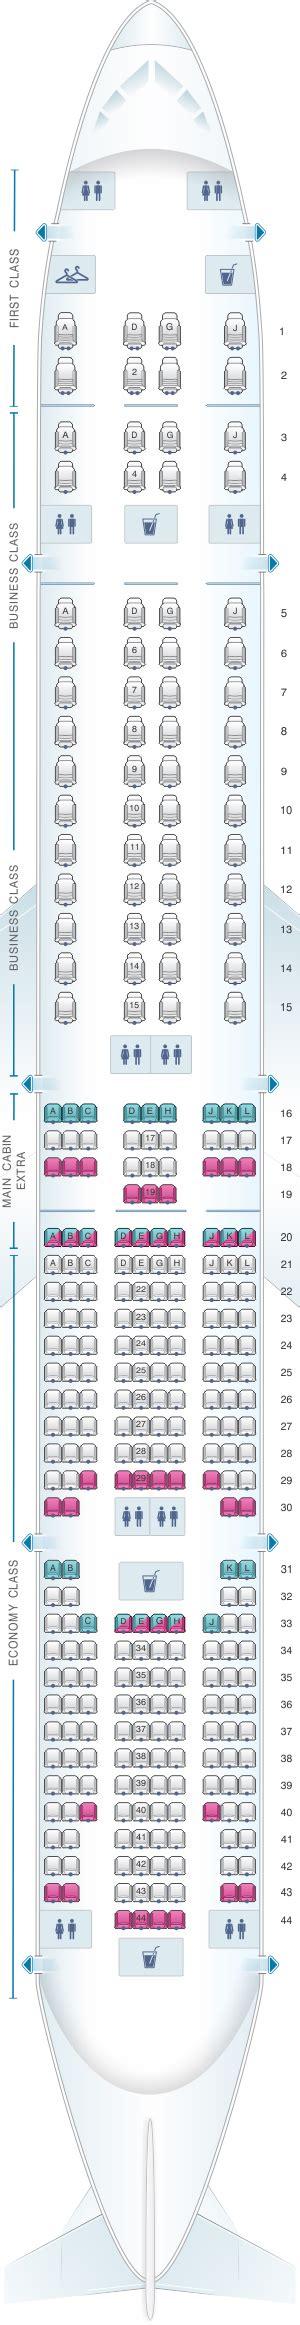 plan si es boeing 777 300er air mapa de asientos airlines boeing b777 300er